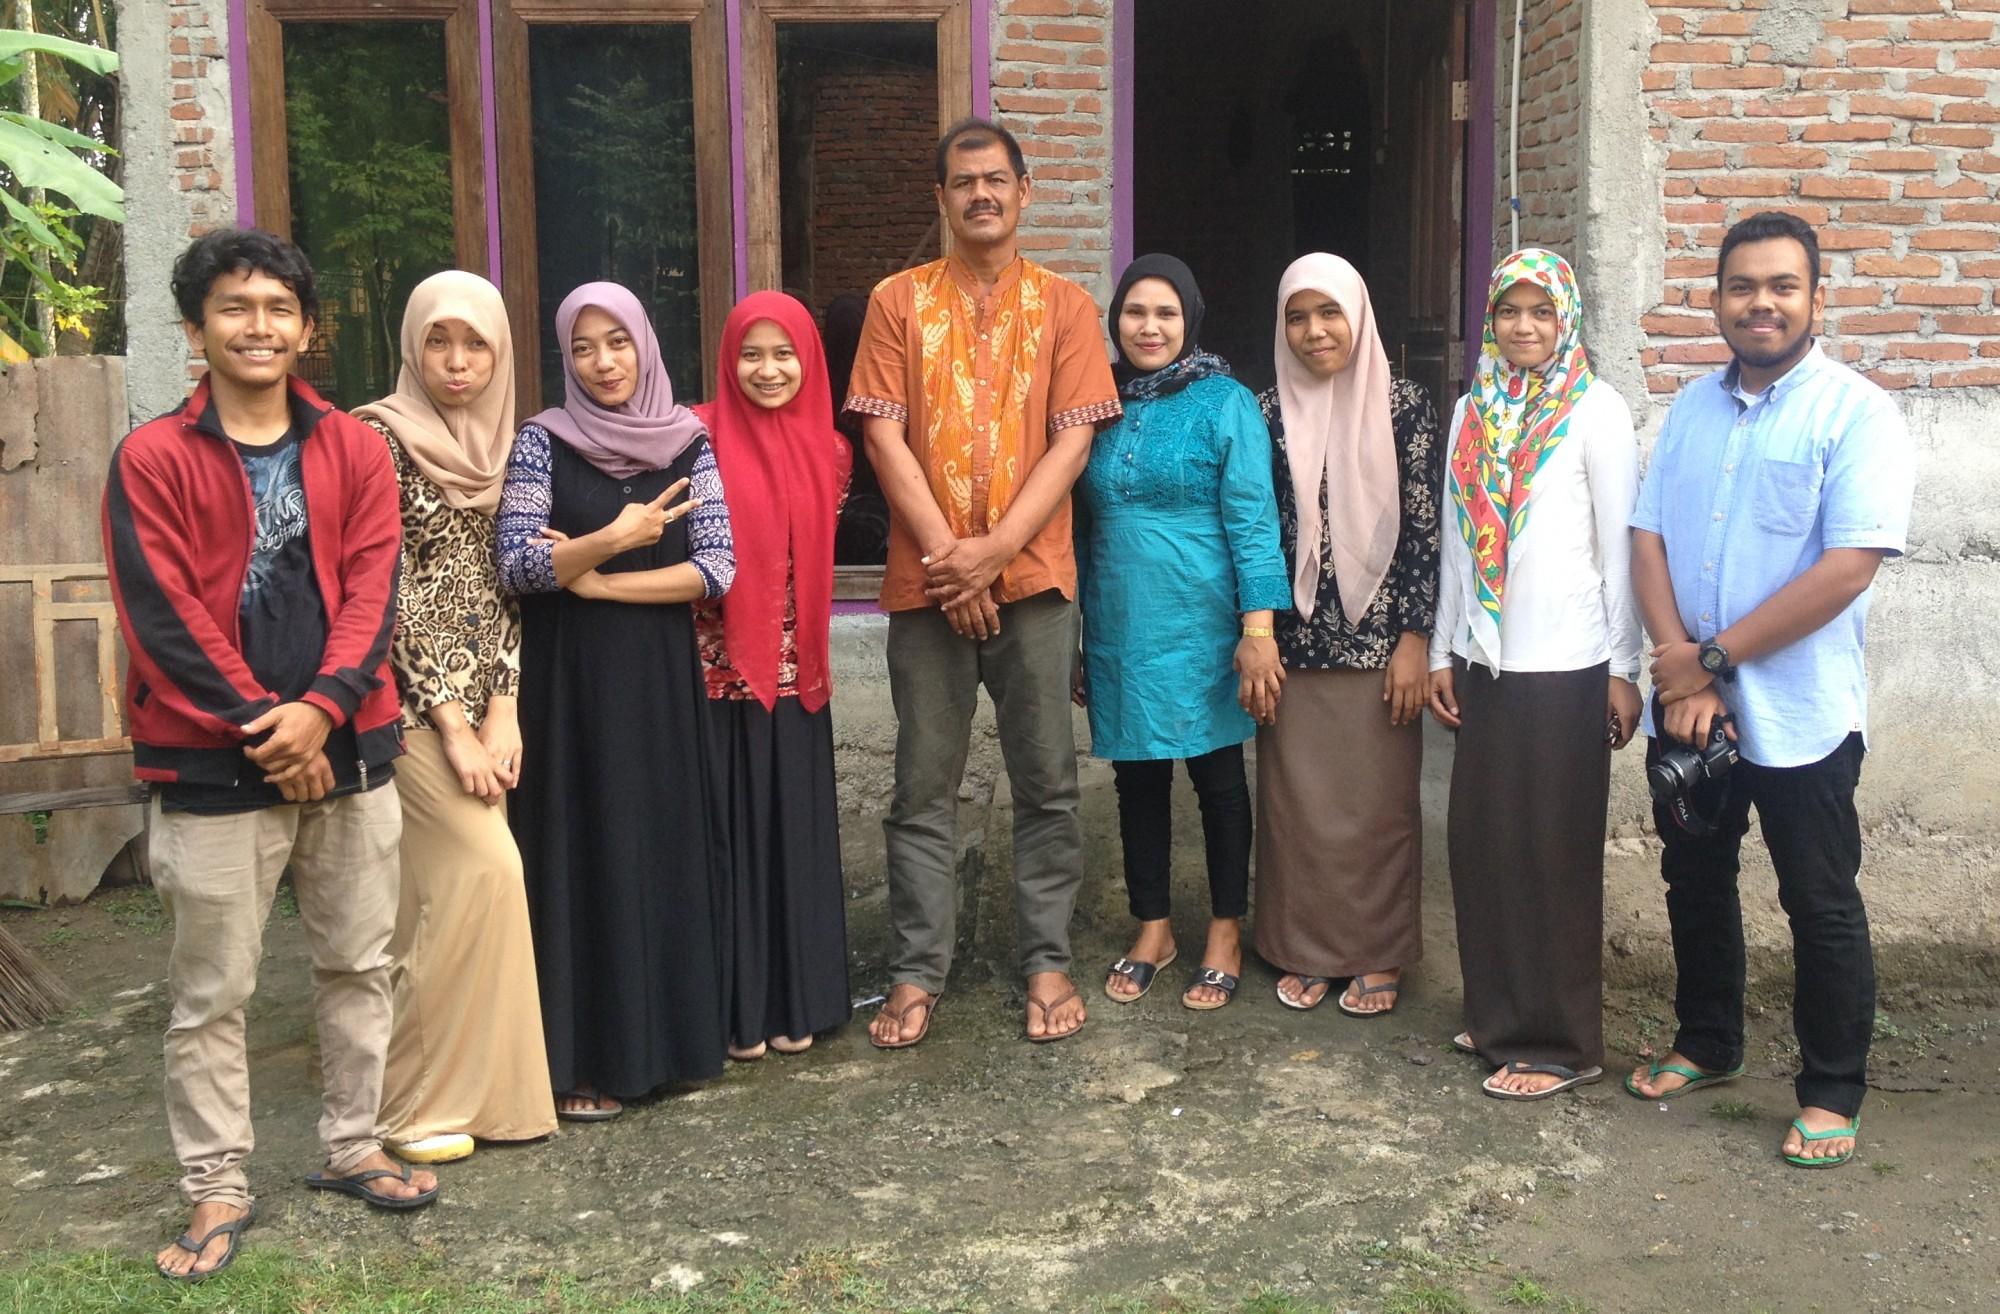 Penanggulangan Bencana Menggambar Mewarnai Kelompok P247 Kkn Unsyiah Agustus 2015